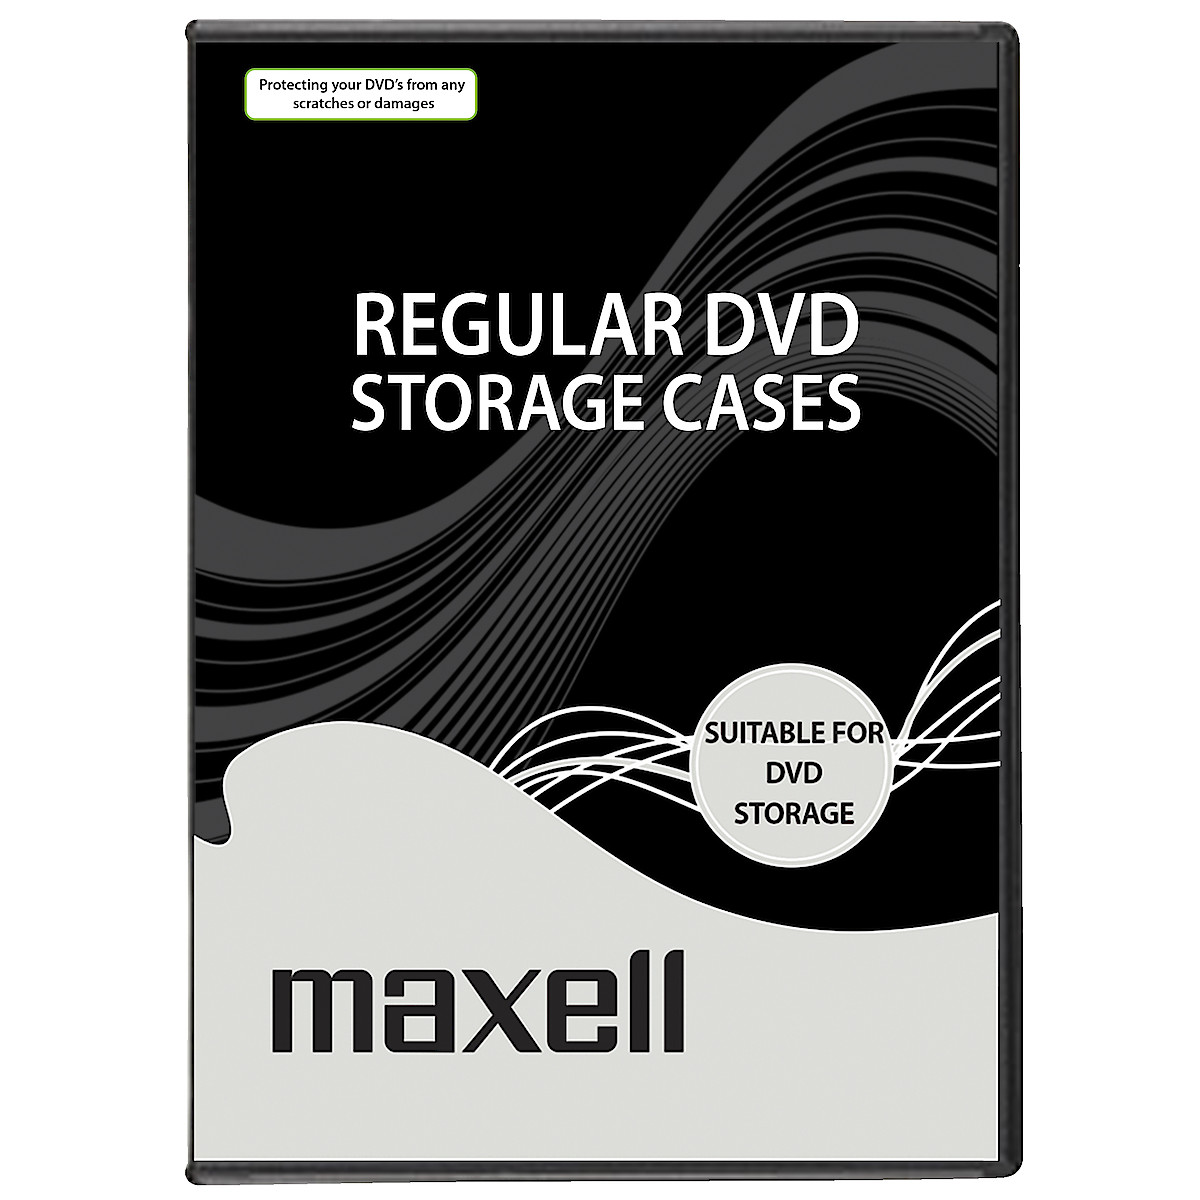 Maxell DVD-futteral 10 stk/pk